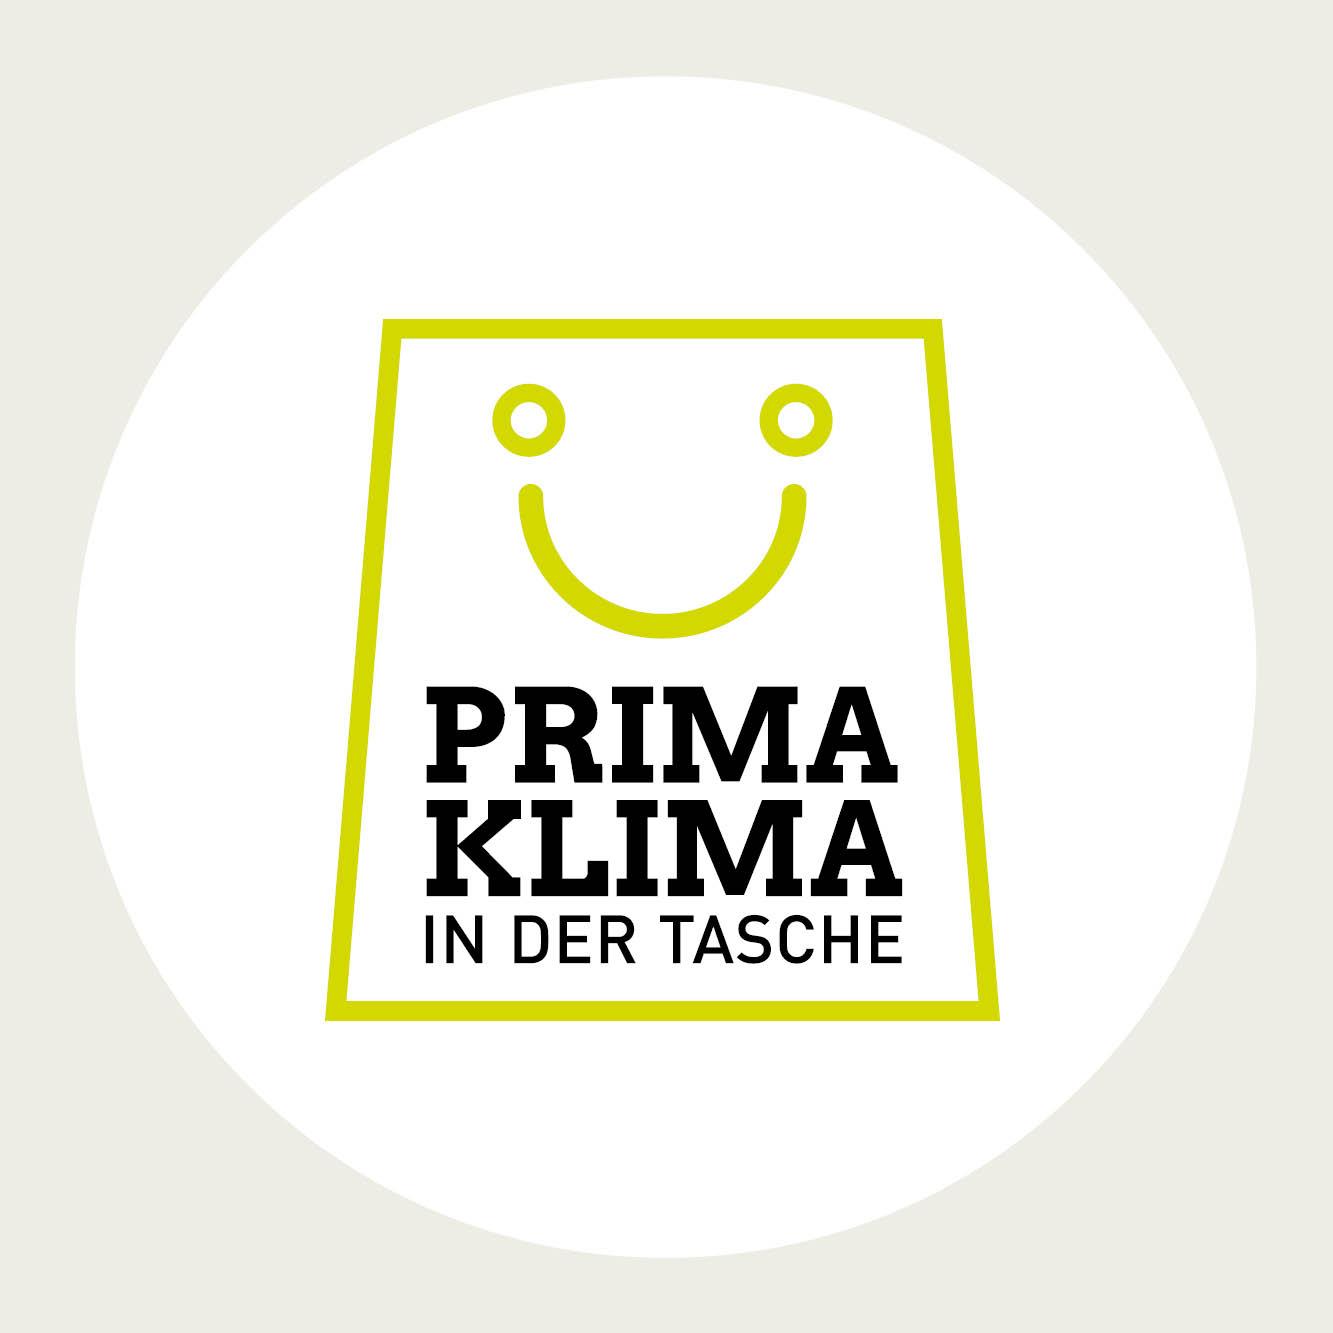 Logo PrimaKlima idT